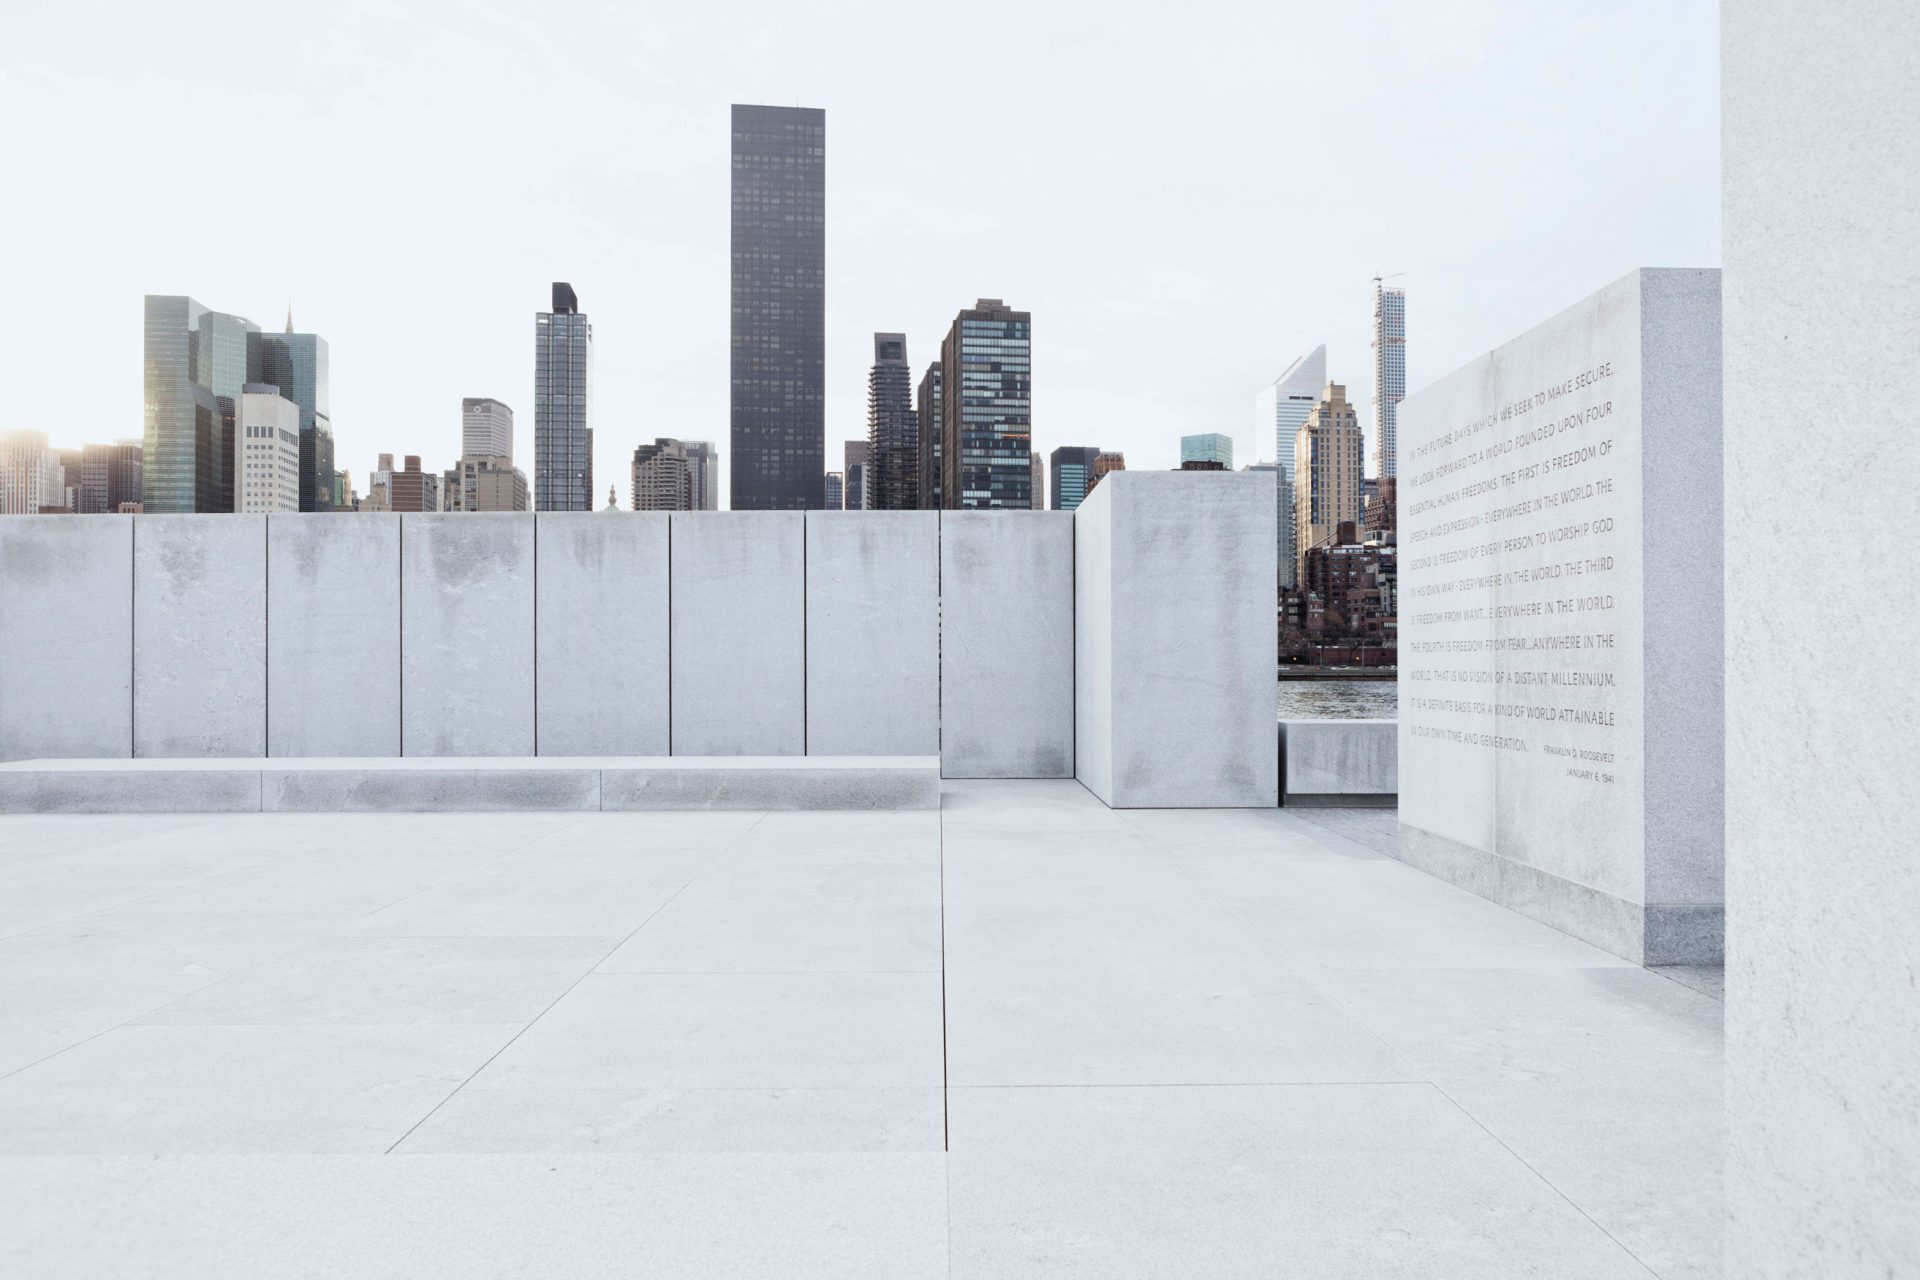 06-simonbosch-photography-simon-bosch-architectuur-architecture-bogota-colombia-New York-Louis Kahn